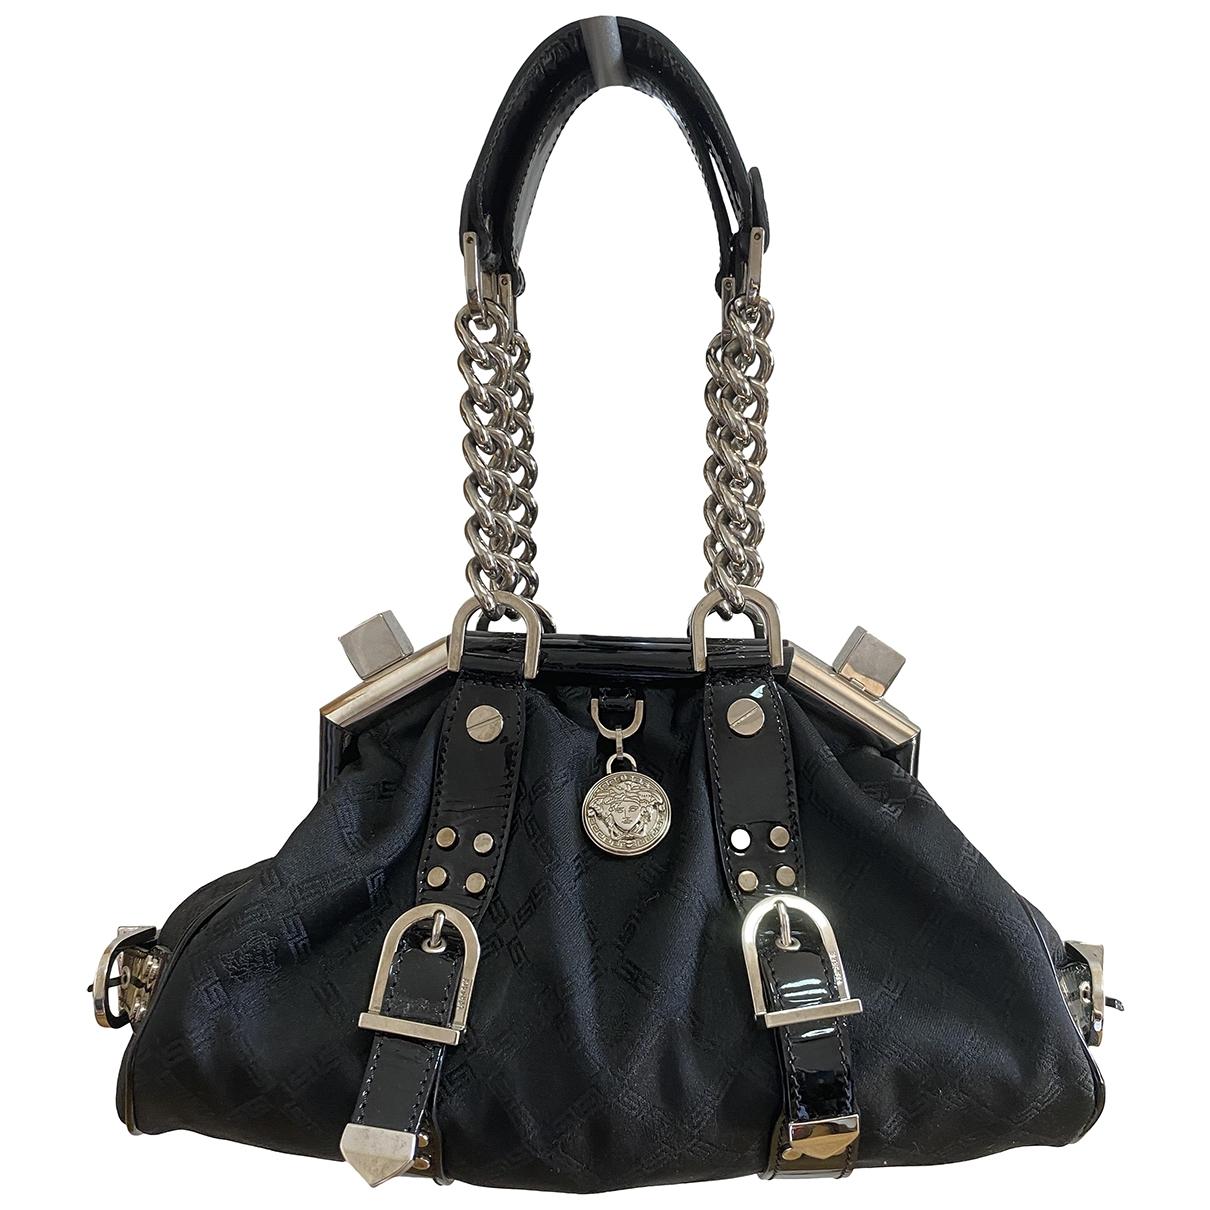 Versace \N Handtasche in  Schwarz Leinen